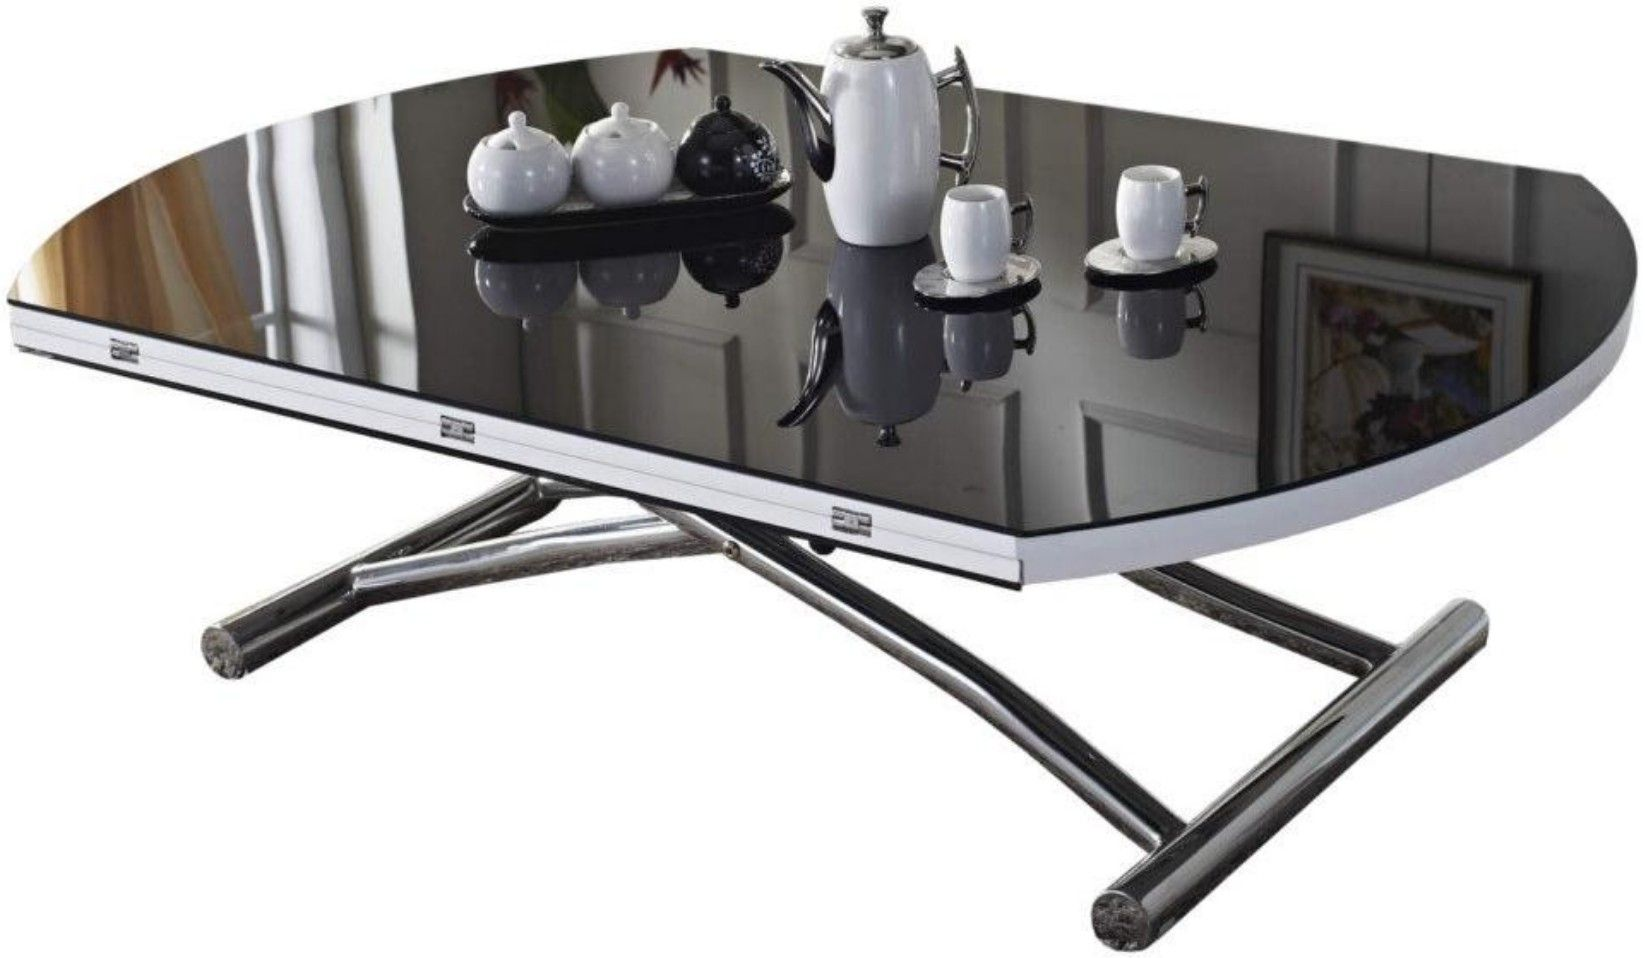 Table Basse Relevable Et Extensible Verre Trempe Noir Alexandra Table Basse Relevable Table Basse Table Basse Ronde